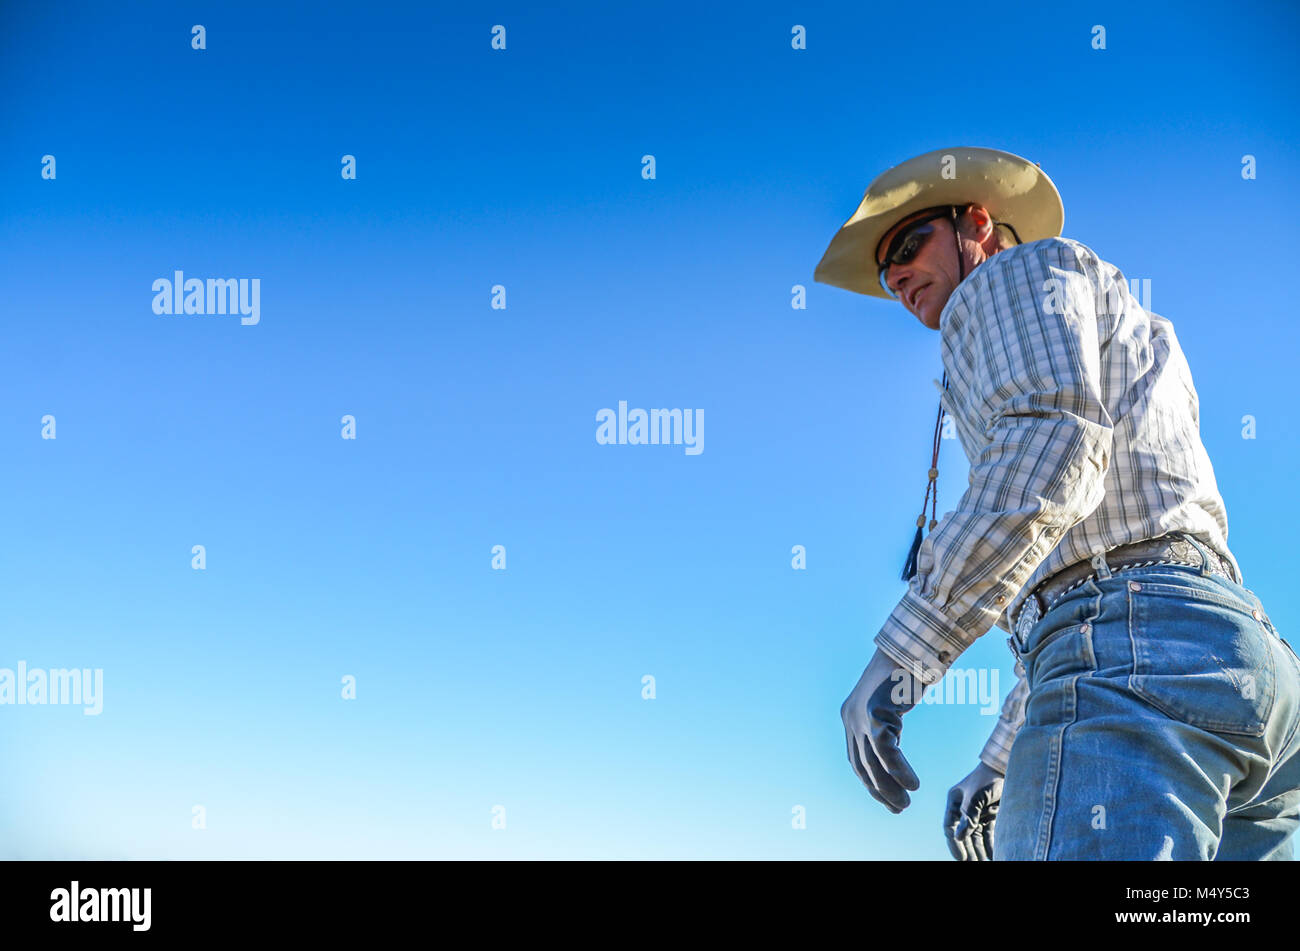 Charmant Cowboy Rahmen Zeitgenössisch - Bilderrahmen Ideen - szurop.info